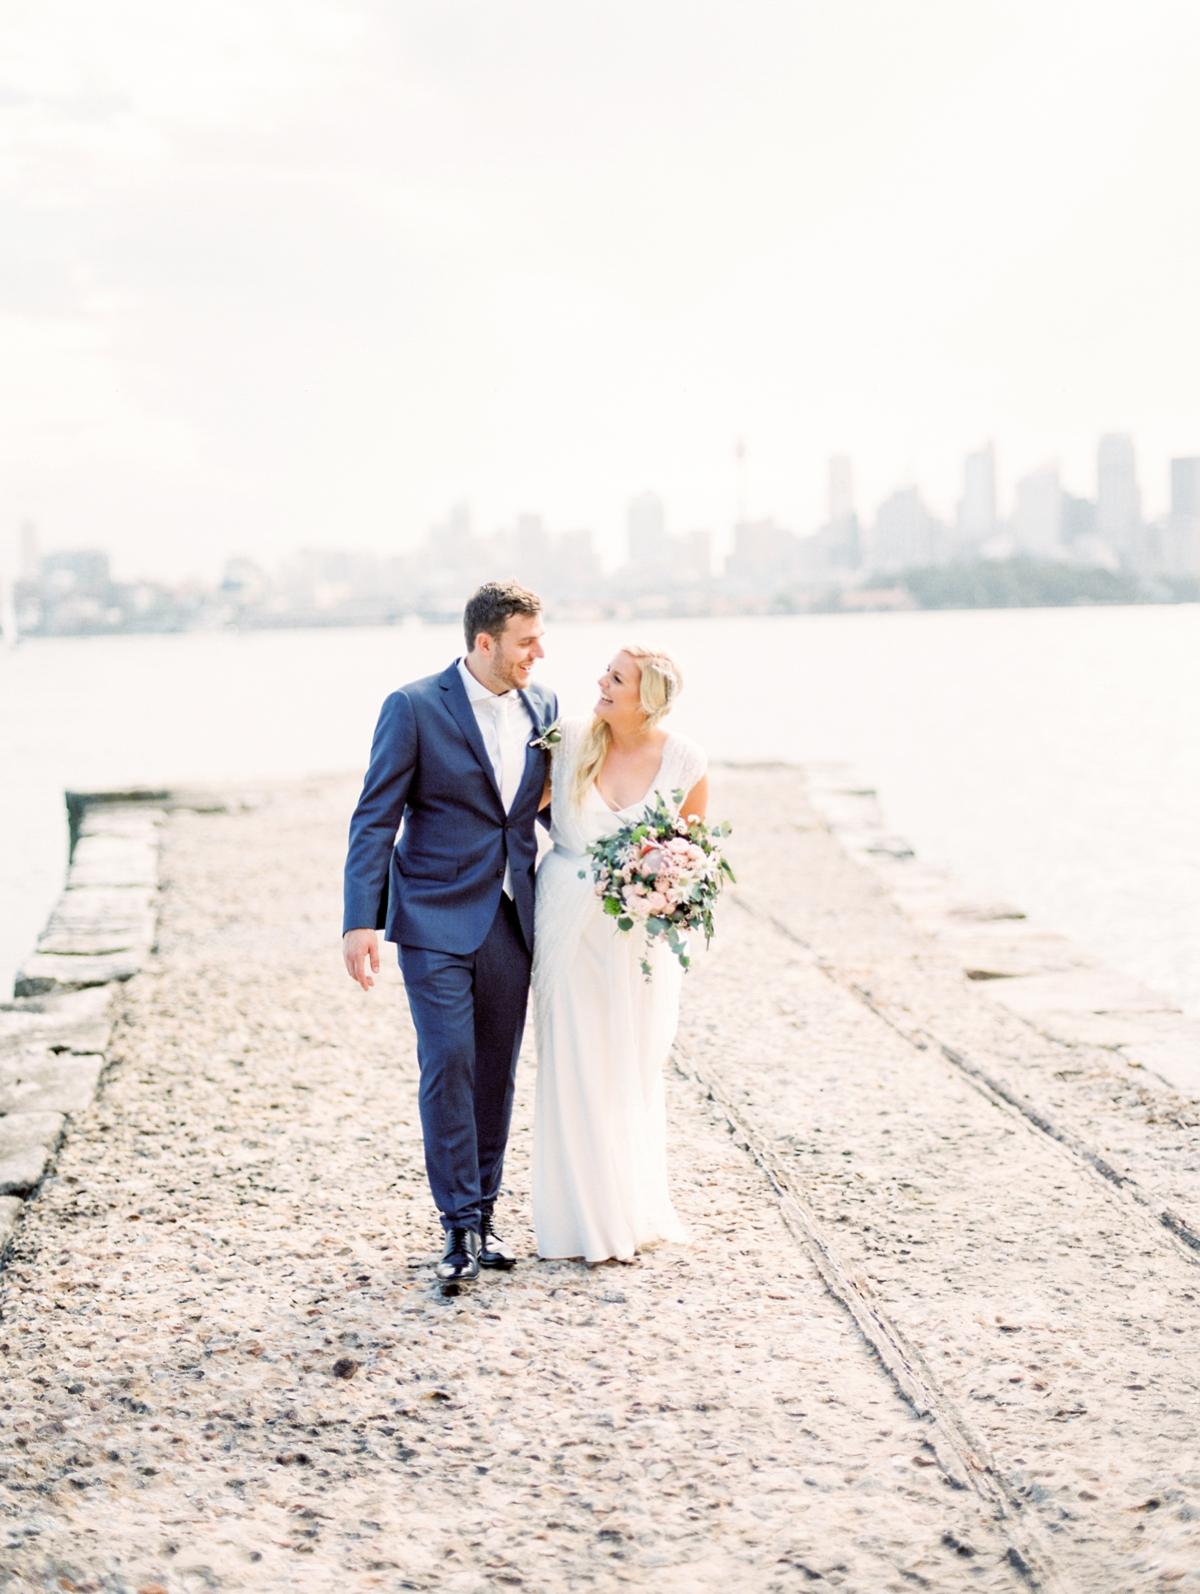 Bradley's Head Wedding Photography by Mr Edwards Sydney_3197.jpg